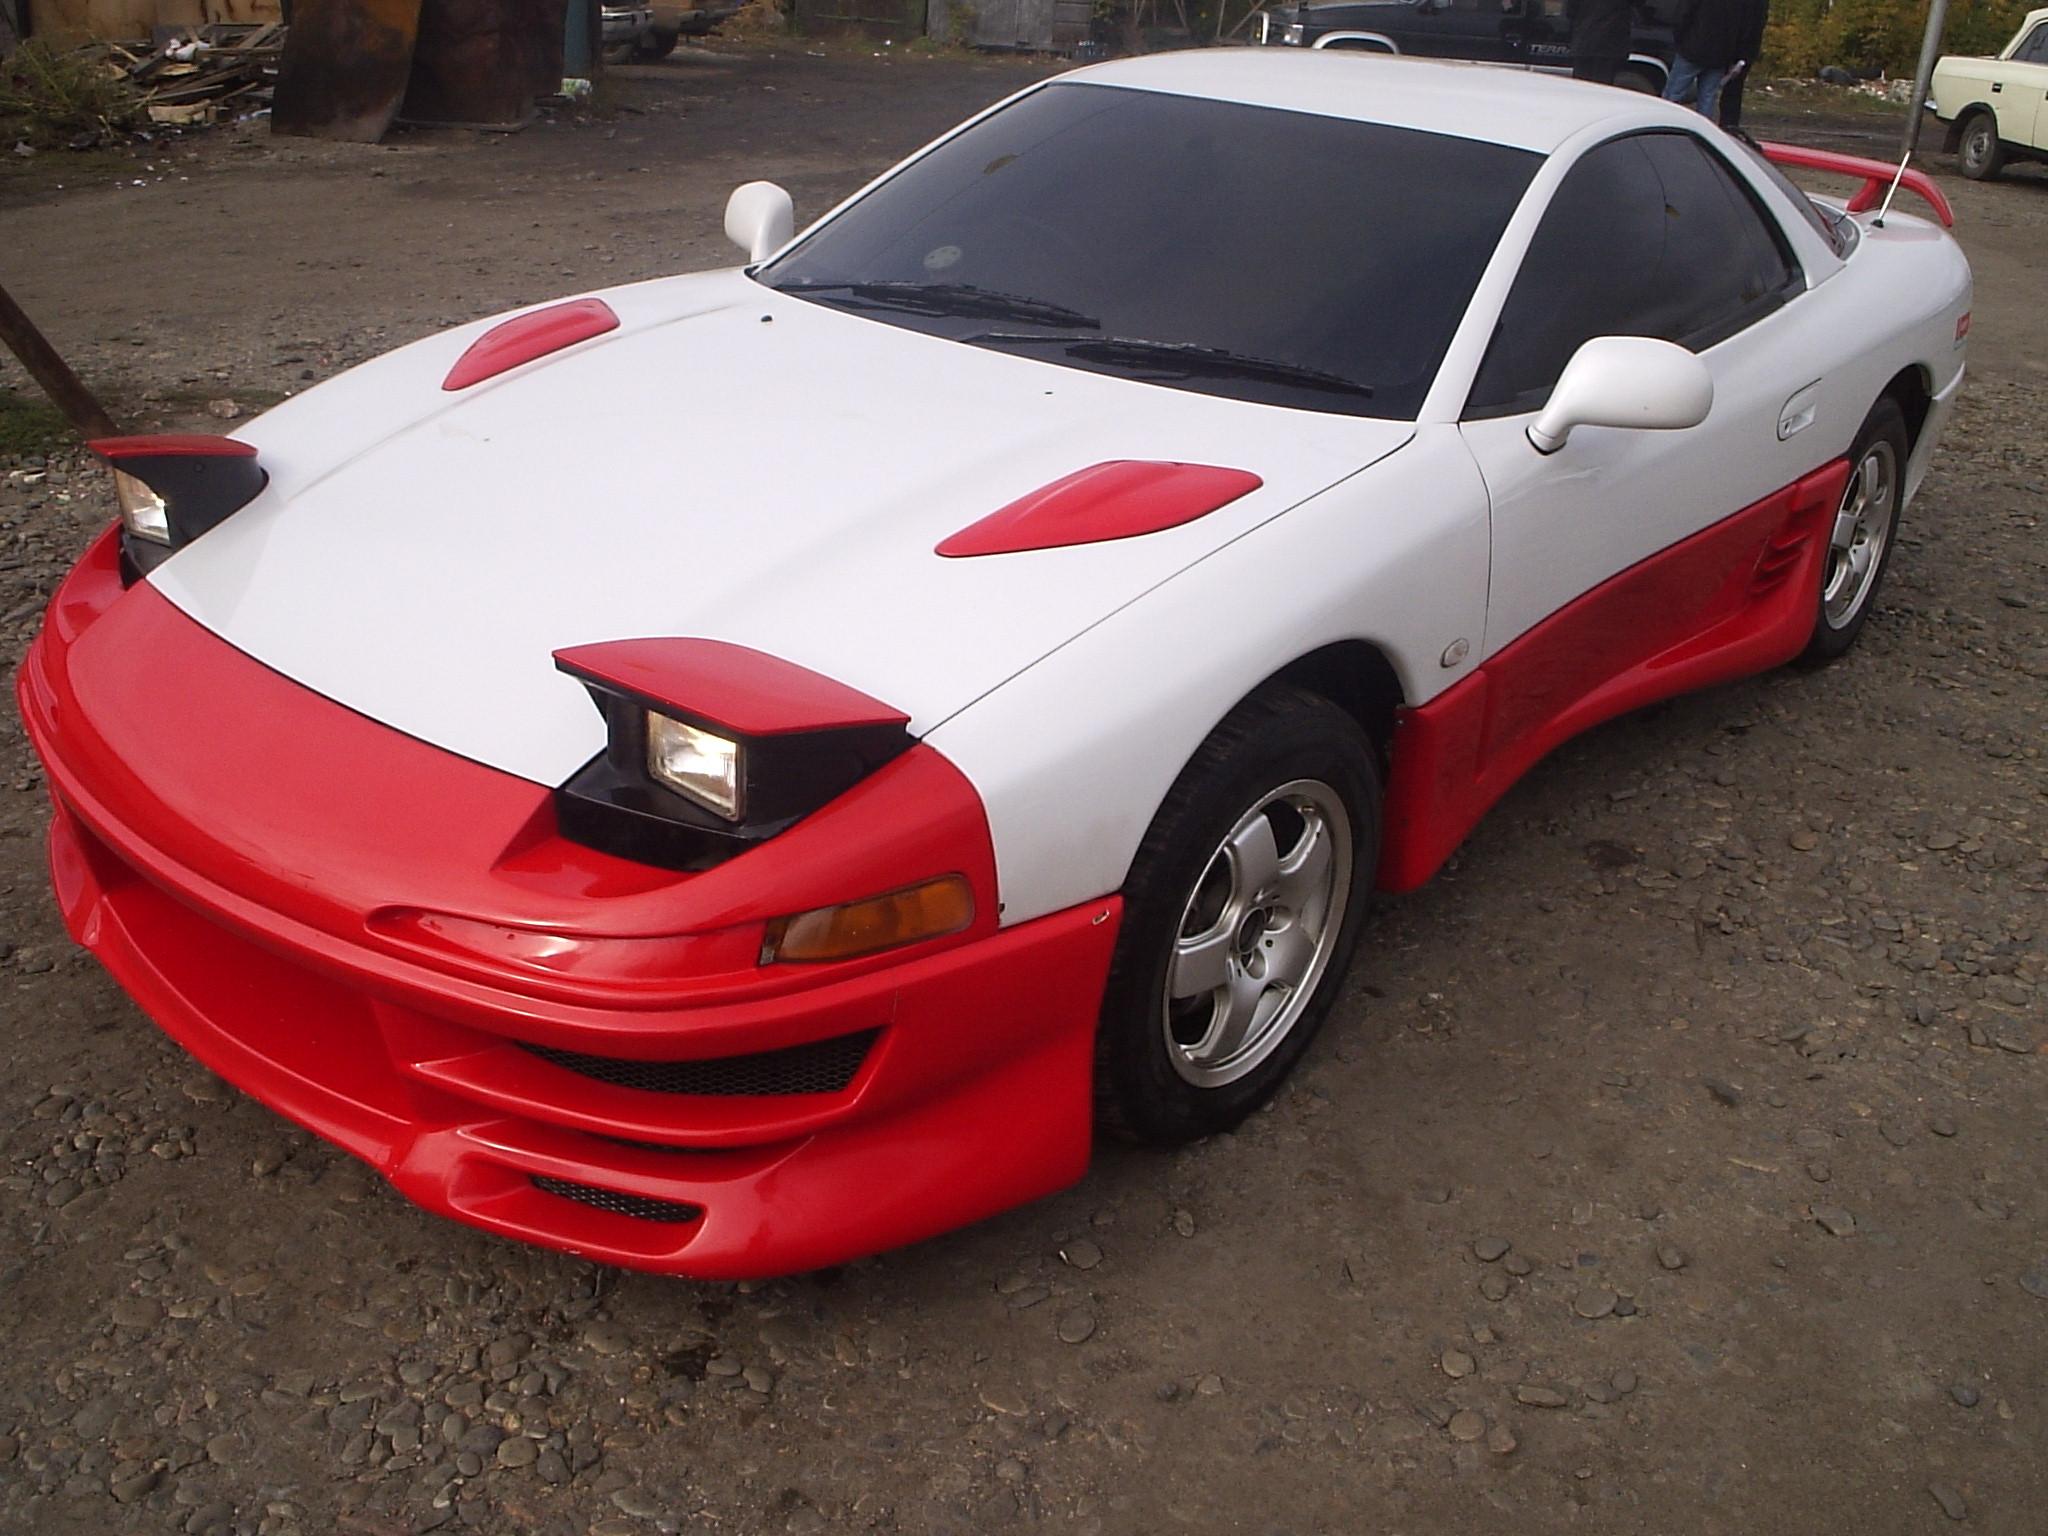 or showthread com dragon turbo red forums supra bodybuilding sale for mitsubishi